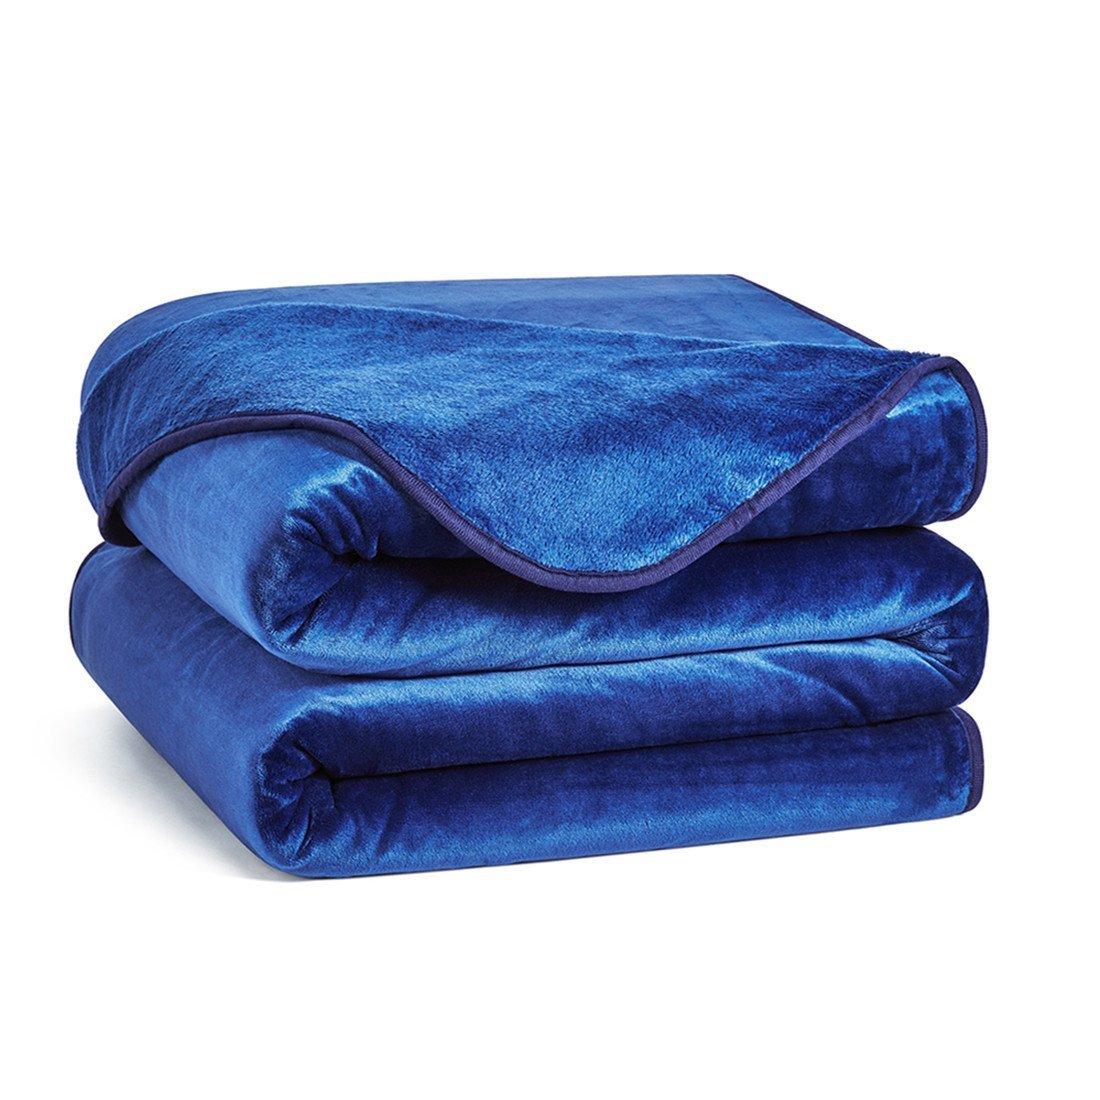 Charm Heart Luxury Fleece Blanket,Queen Size Lightweight Silky Super Soft Summer Cooling Cozy Flannel Warm Plush All-Season Anti-static Bed Couch Sofa Blanket(Queen,Dark Blue)